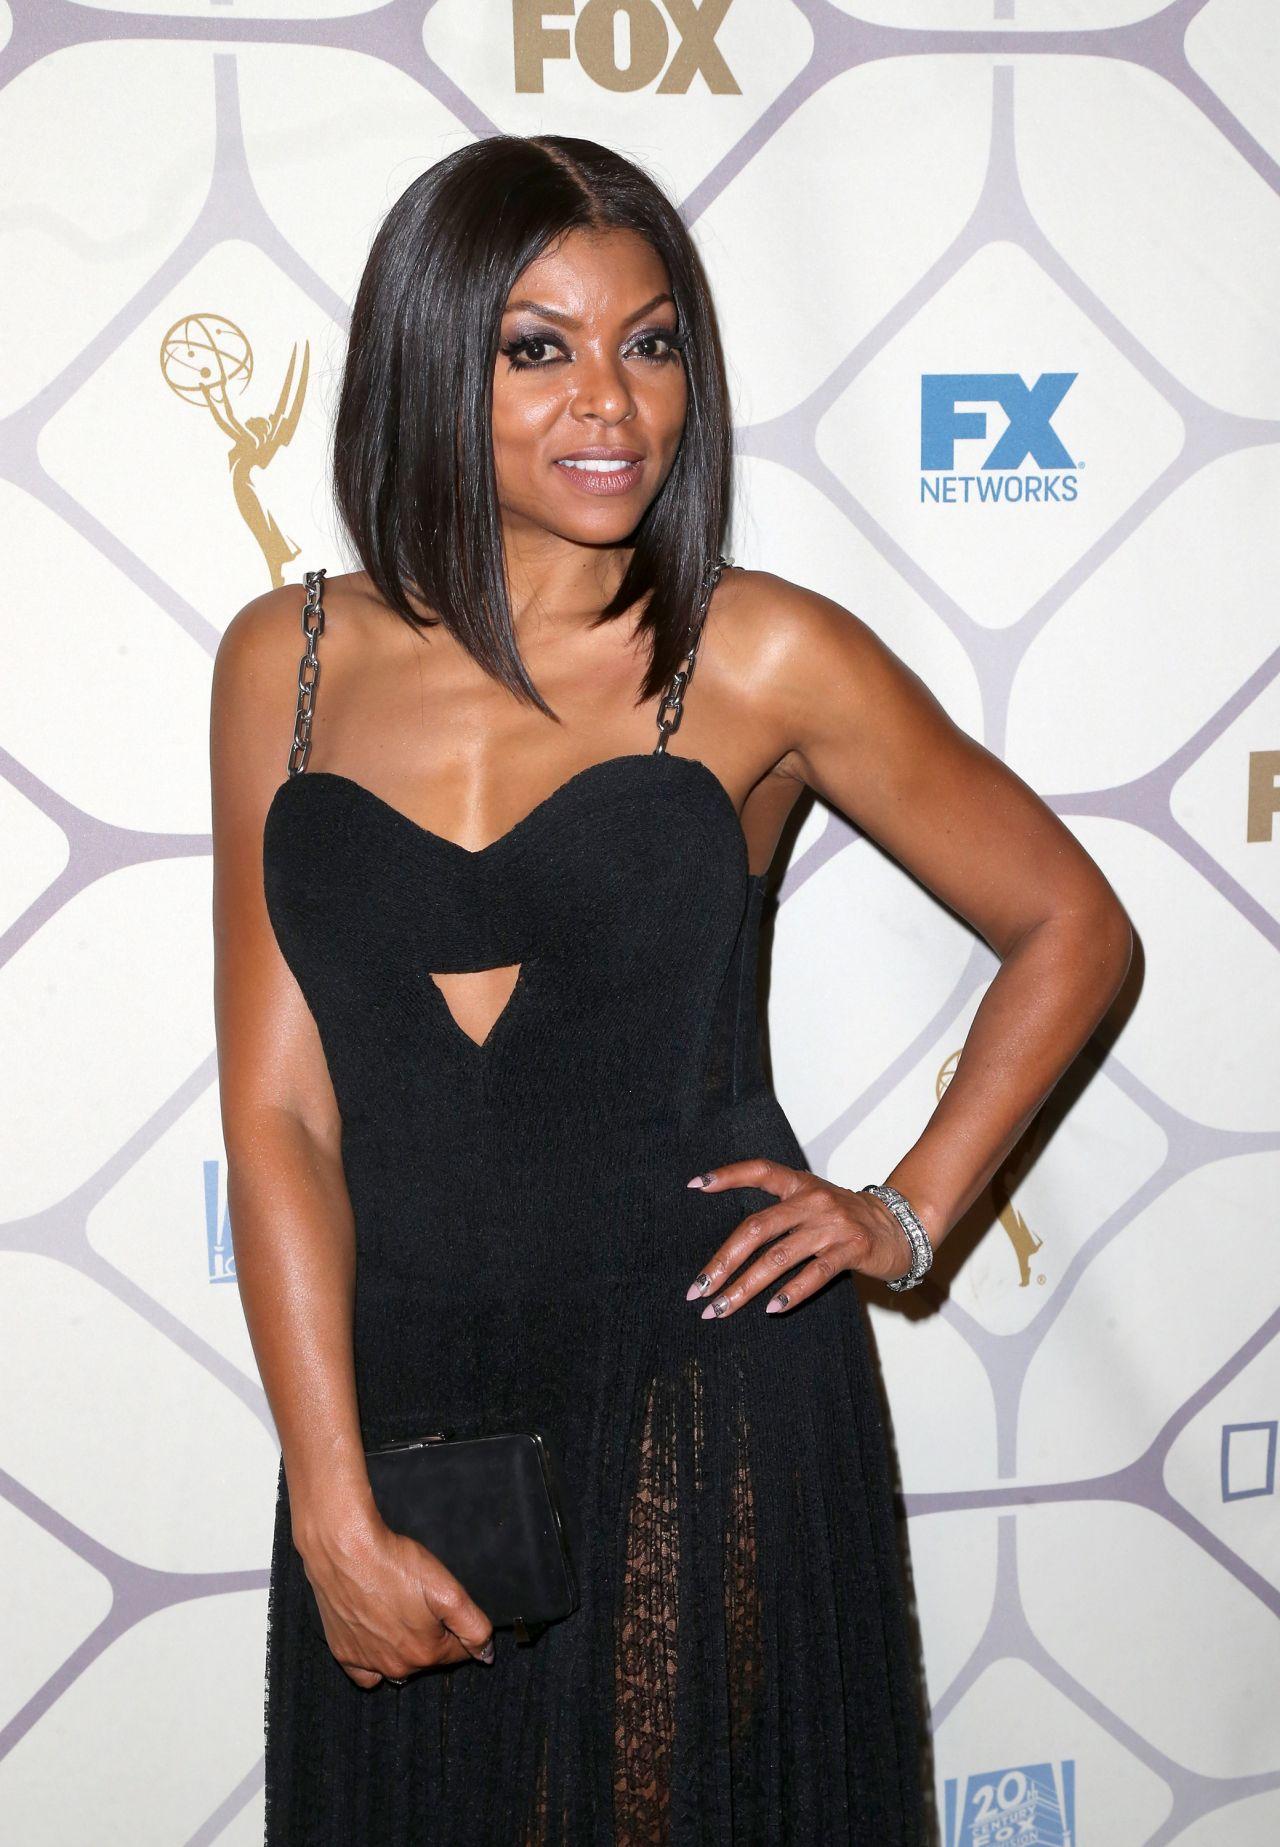 Taraji P. Henson – 2015 Primetime Emmy Awards Fox After Party in Los Angeles